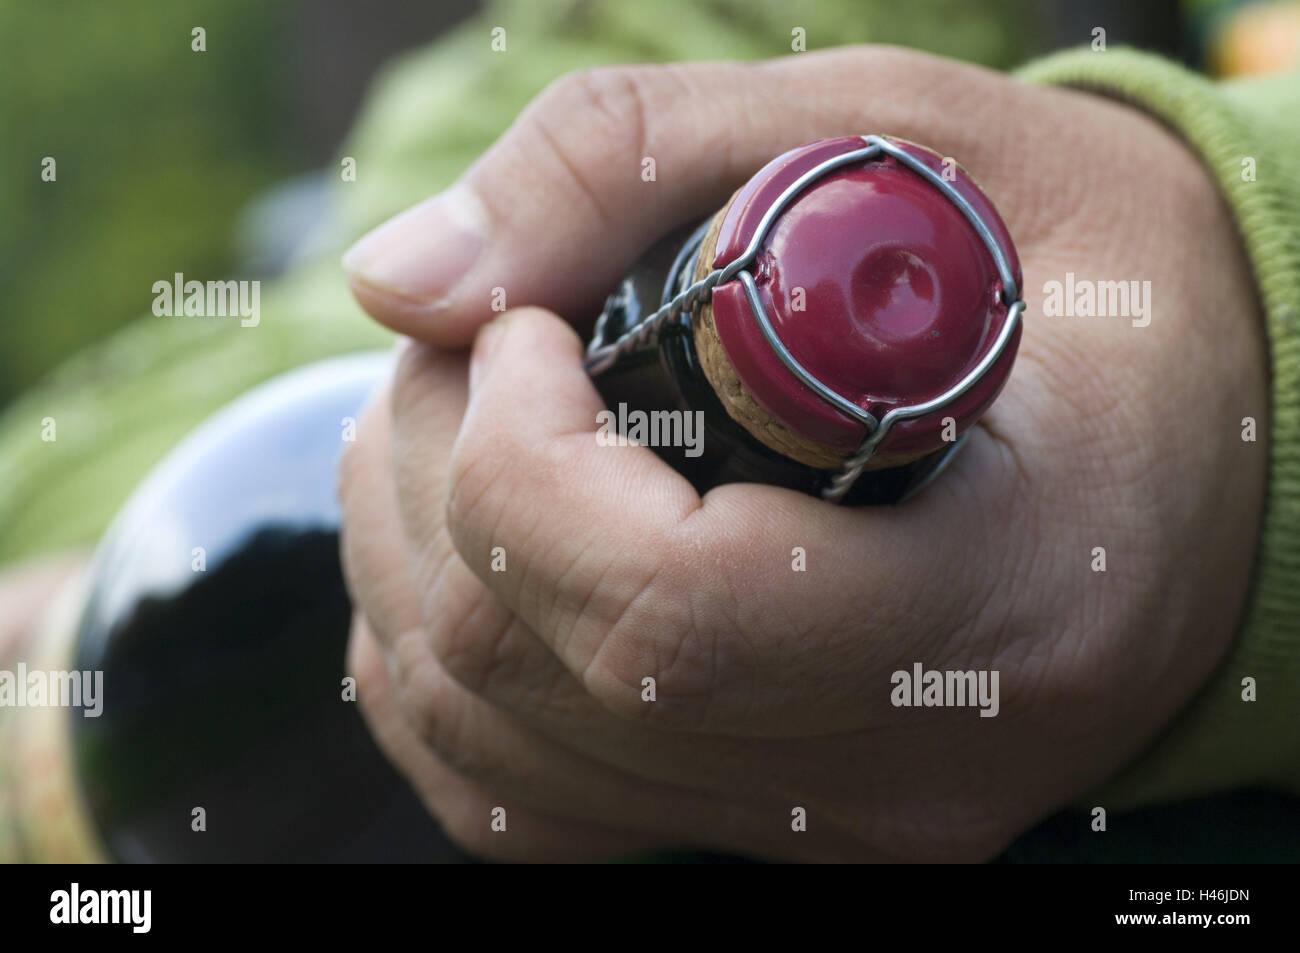 Las manos del hombre, mantenga la botella de sidra, media de cerca, botella, frasco de cristal, botella de vino Imagen De Stock